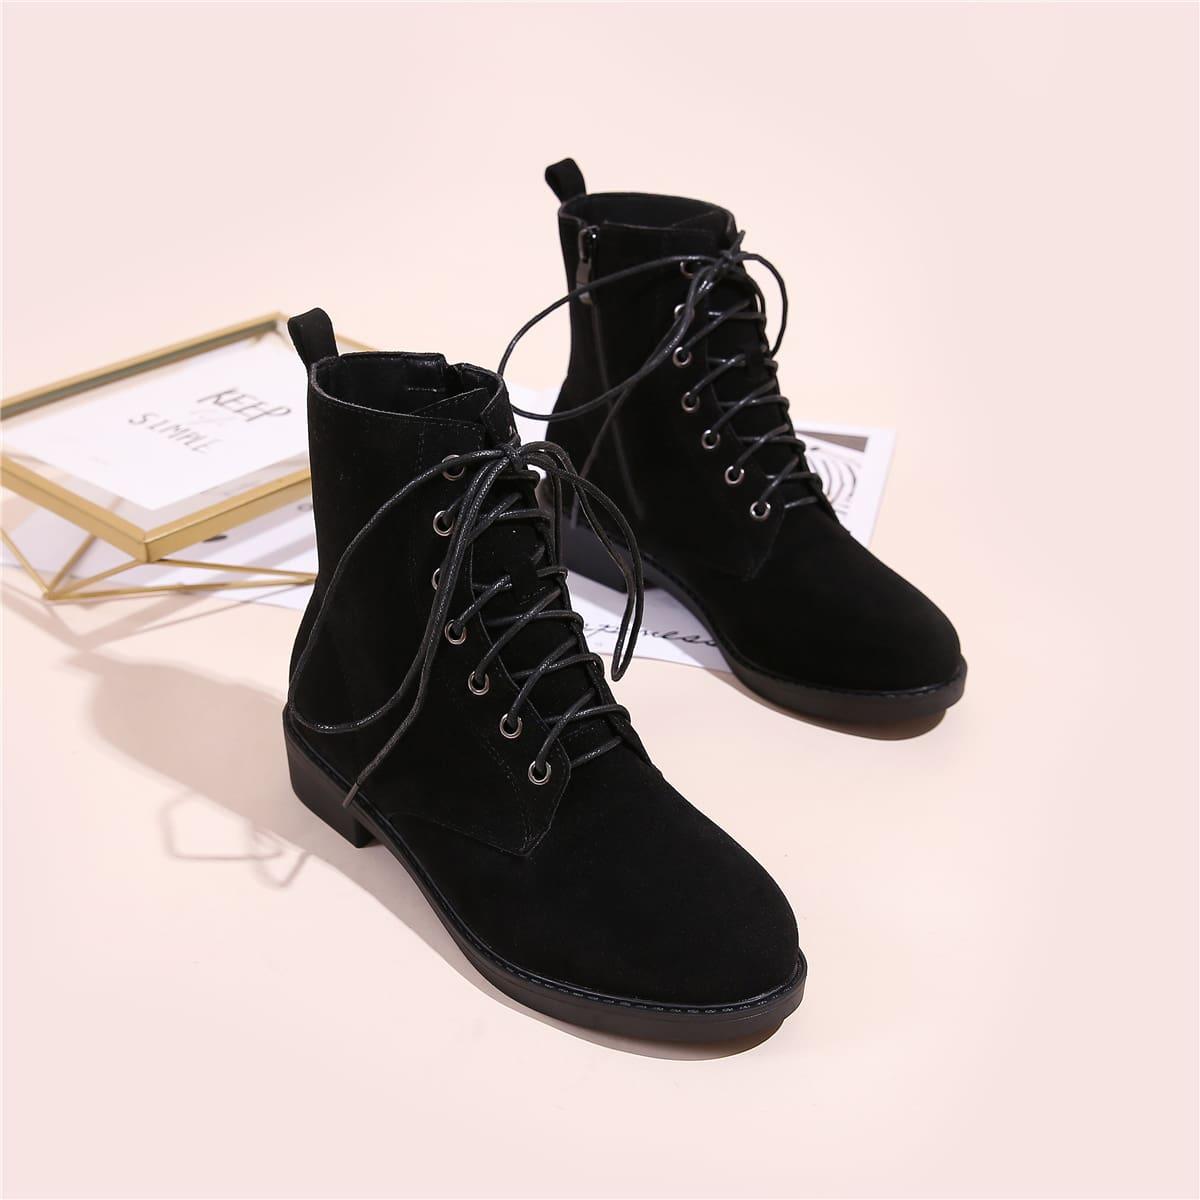 Замшевые сапоги на шнурках с молнией